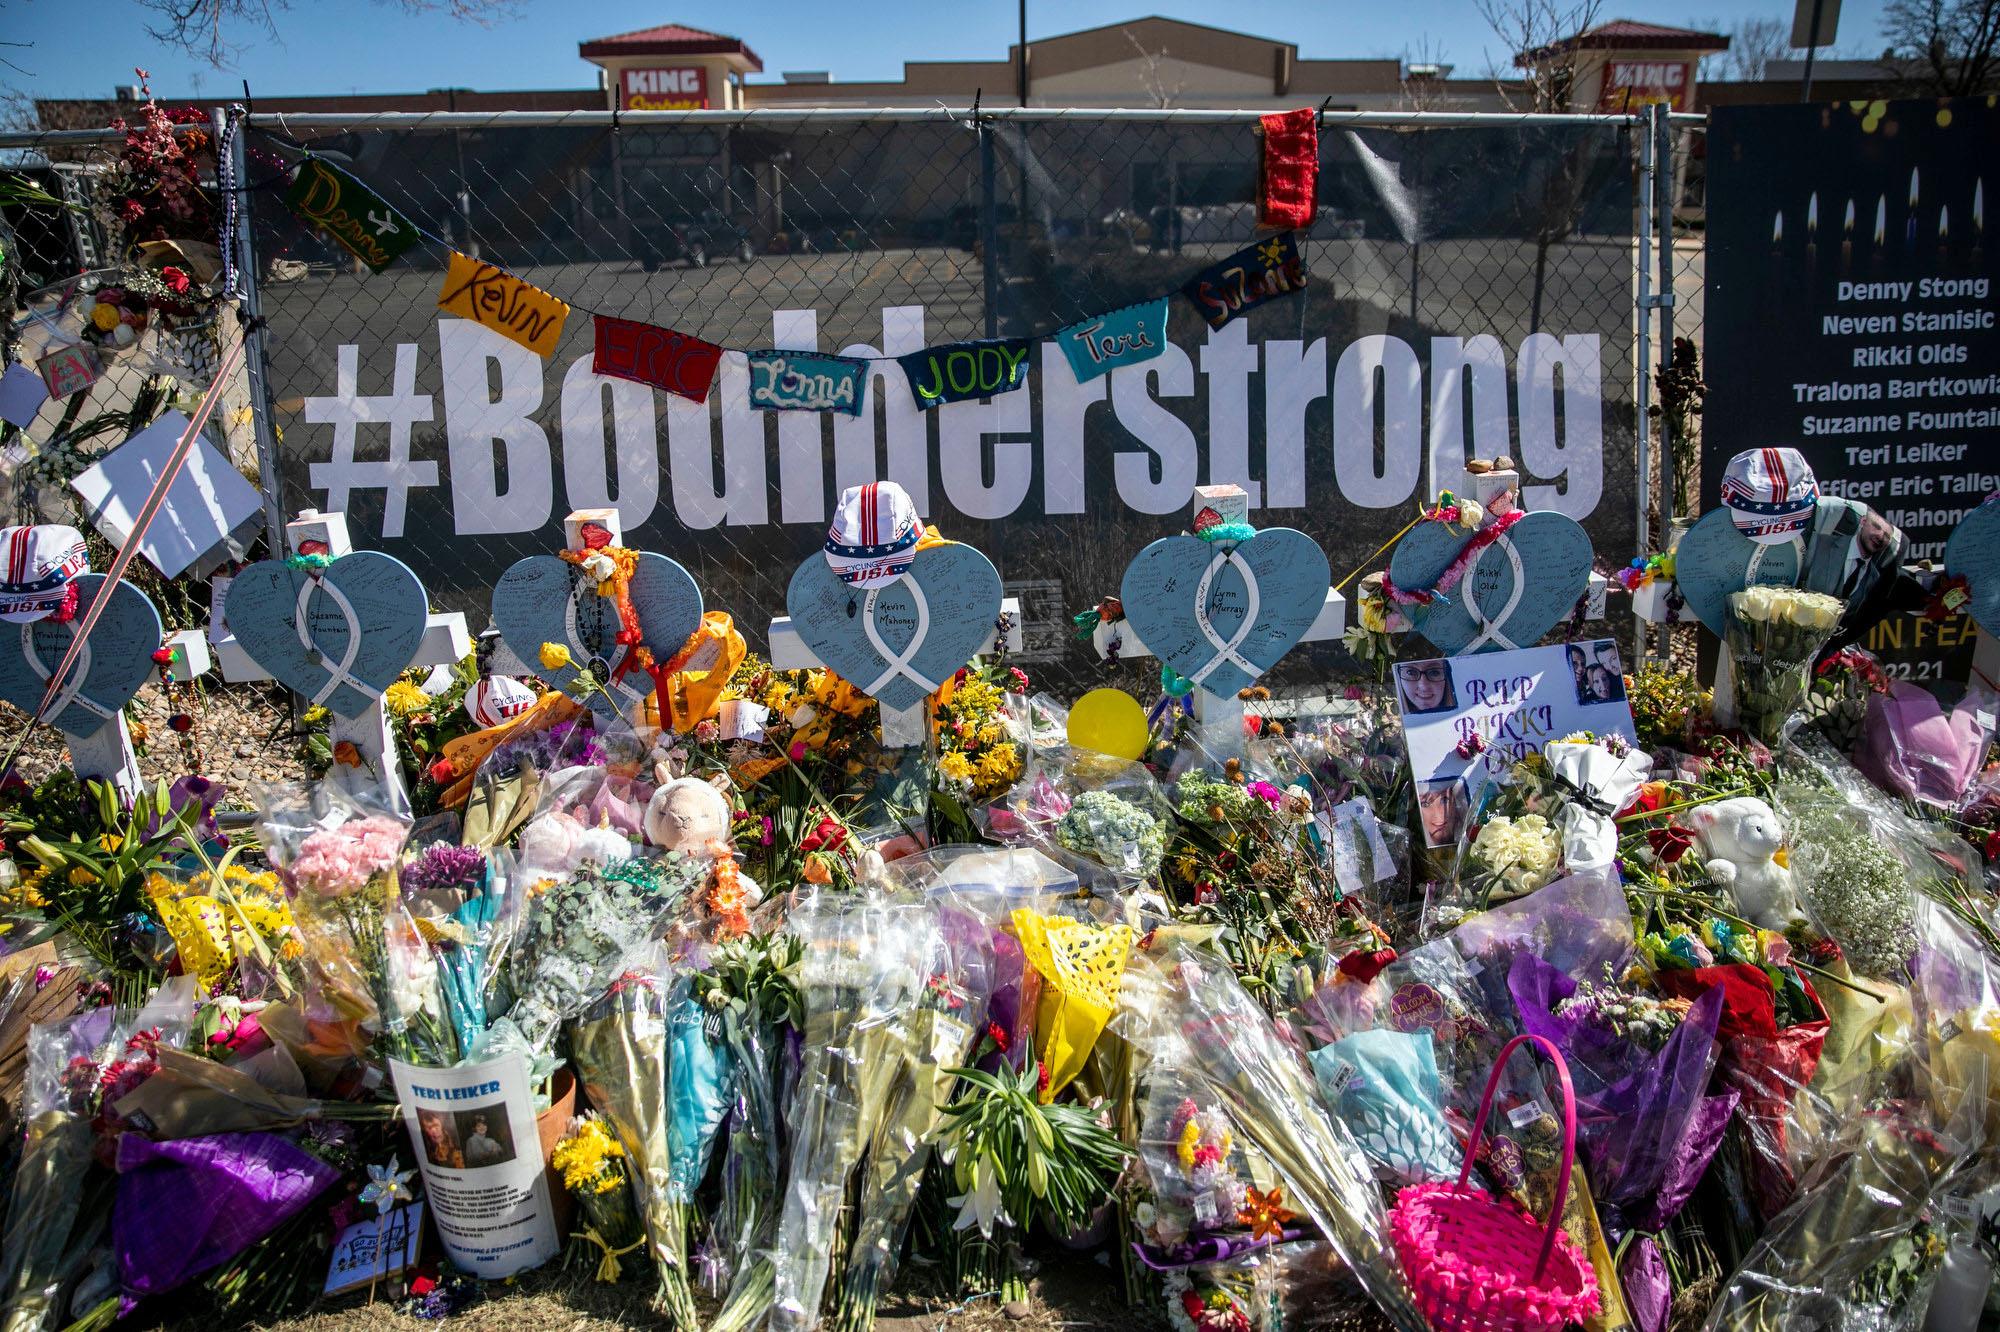 210329-BOULDER-SHOOTING-MEMORIAL-FLOWERS-SIGNS